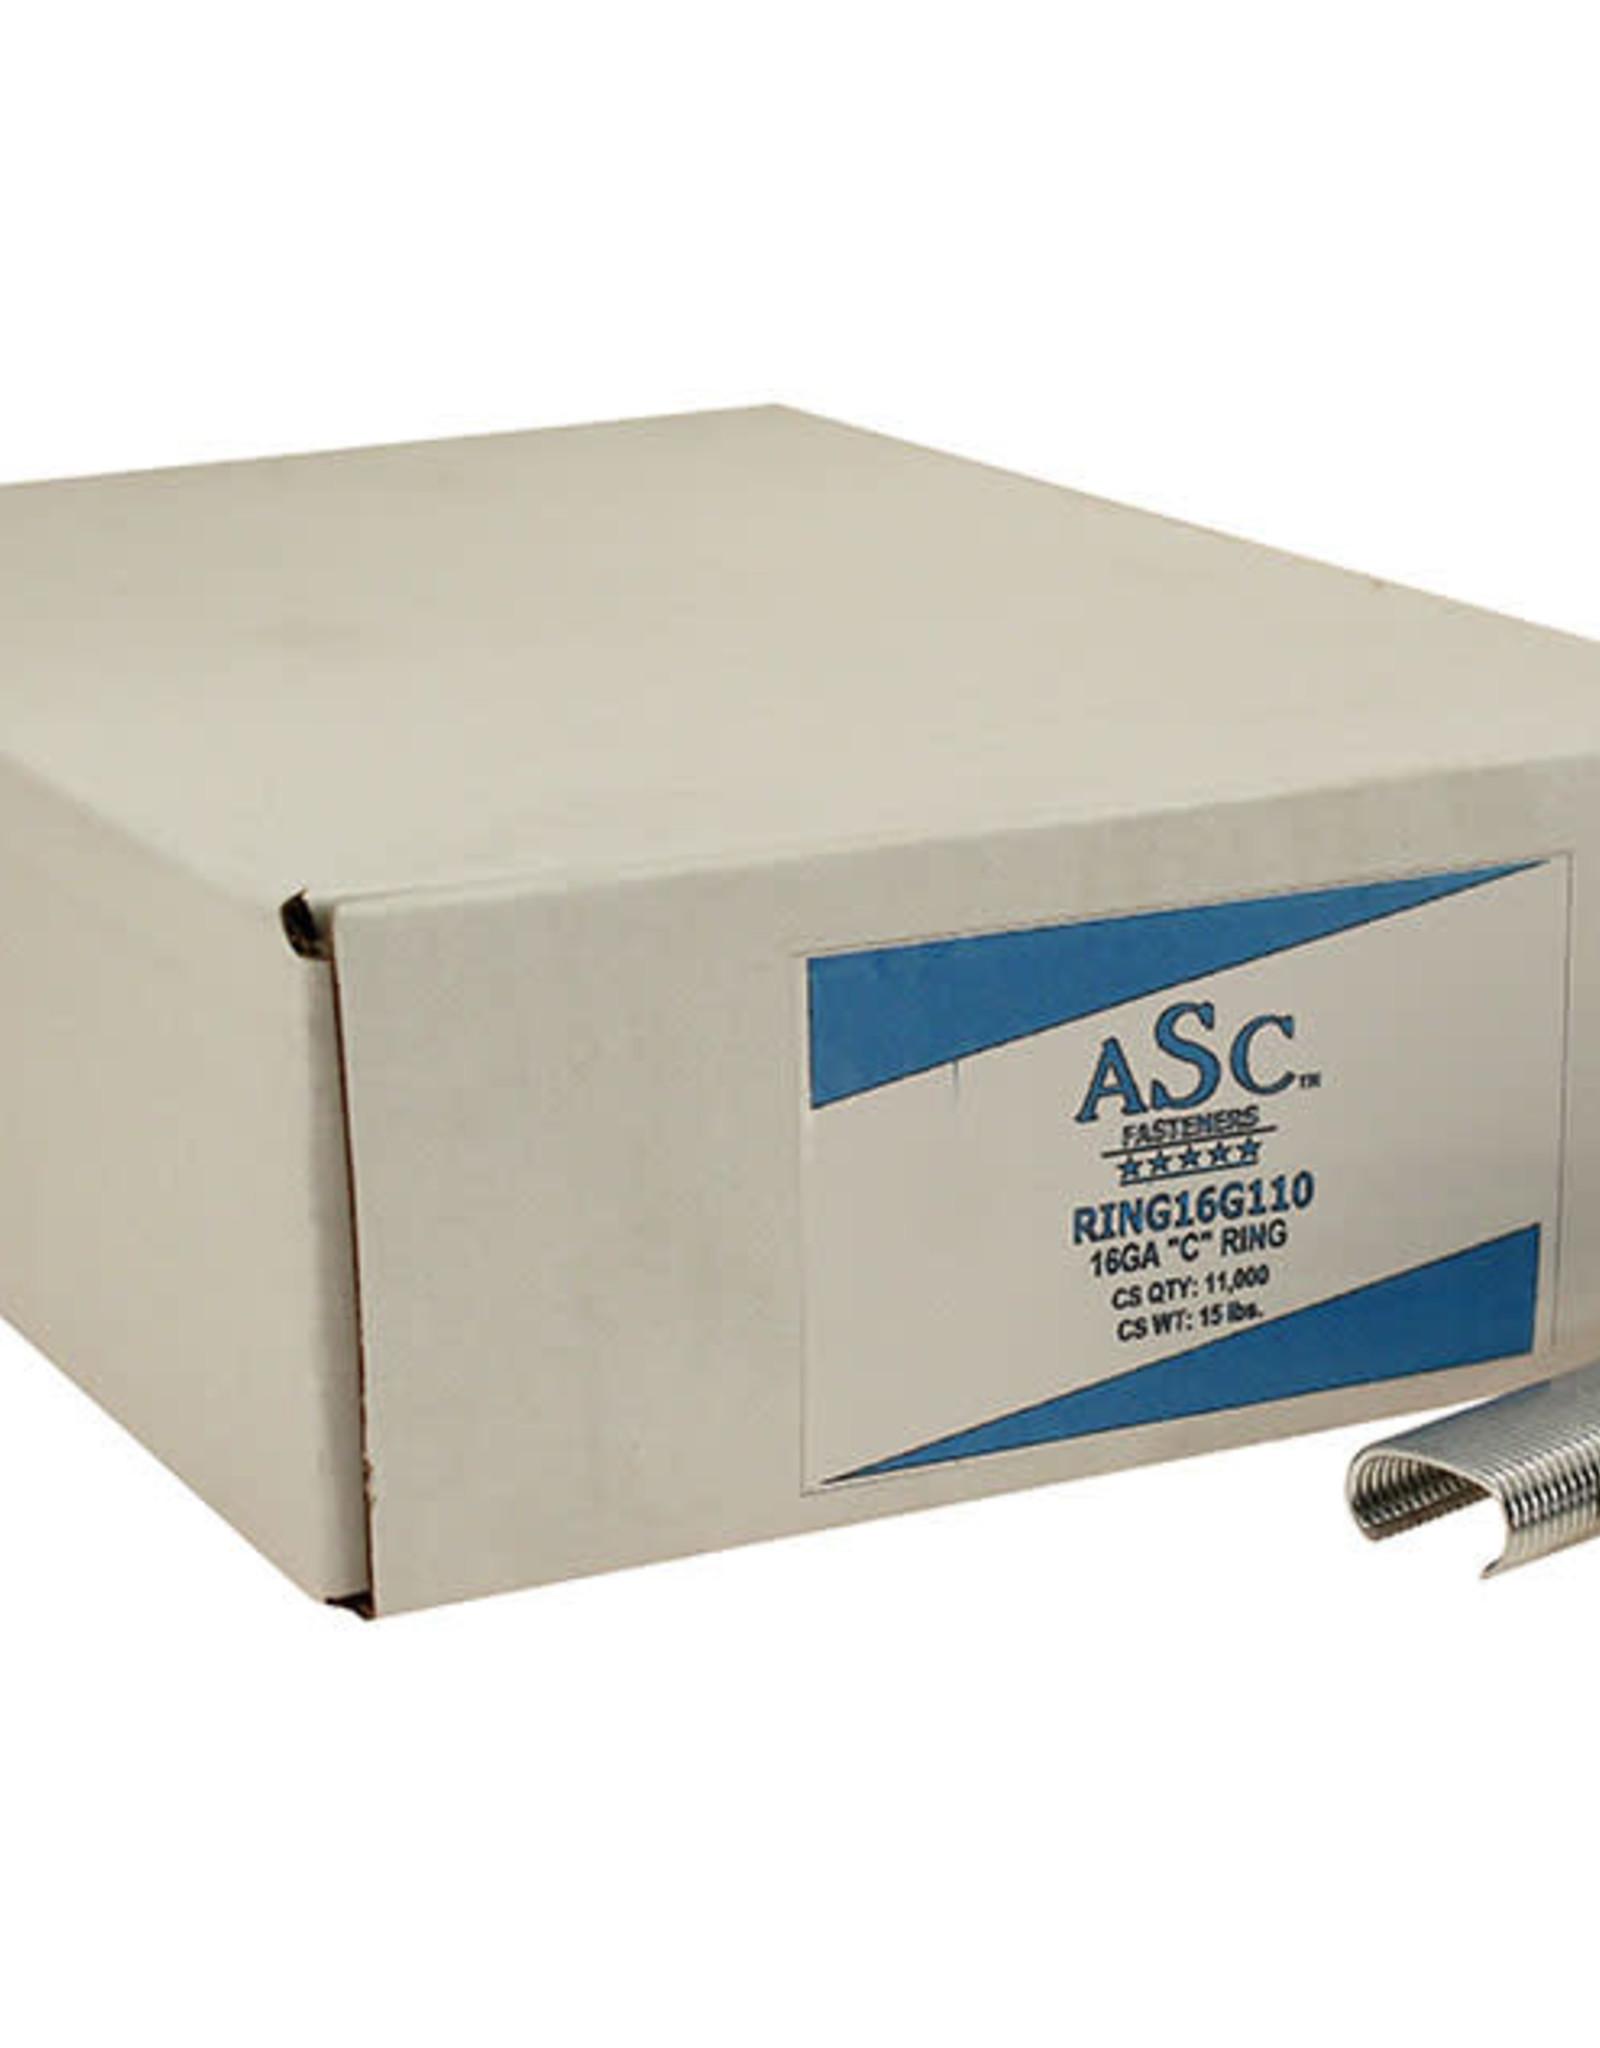 "ASC Hog C-Rings, SZ. 3/4"" Galvanized - Case of 11,000 Rings"